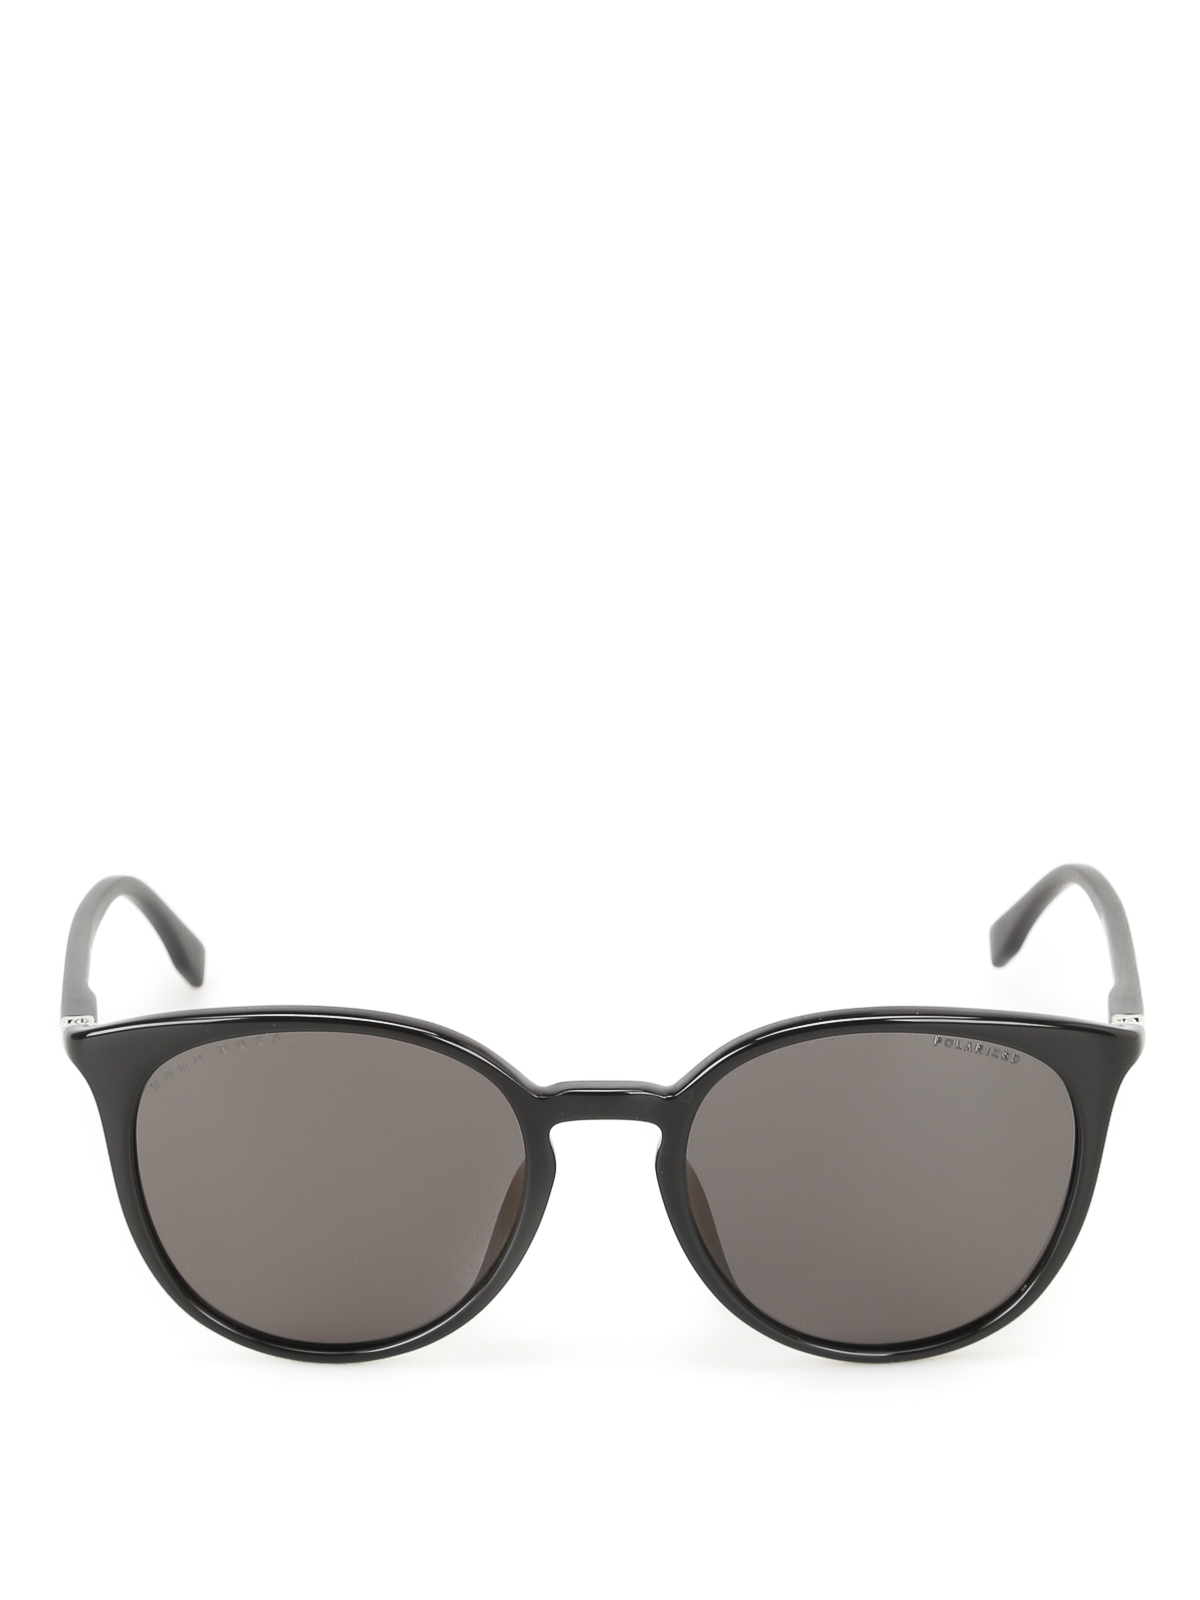 8fdfe03b7b iKRIX Hugo Boss  sunglasses - Polarized round lenses sunglasses